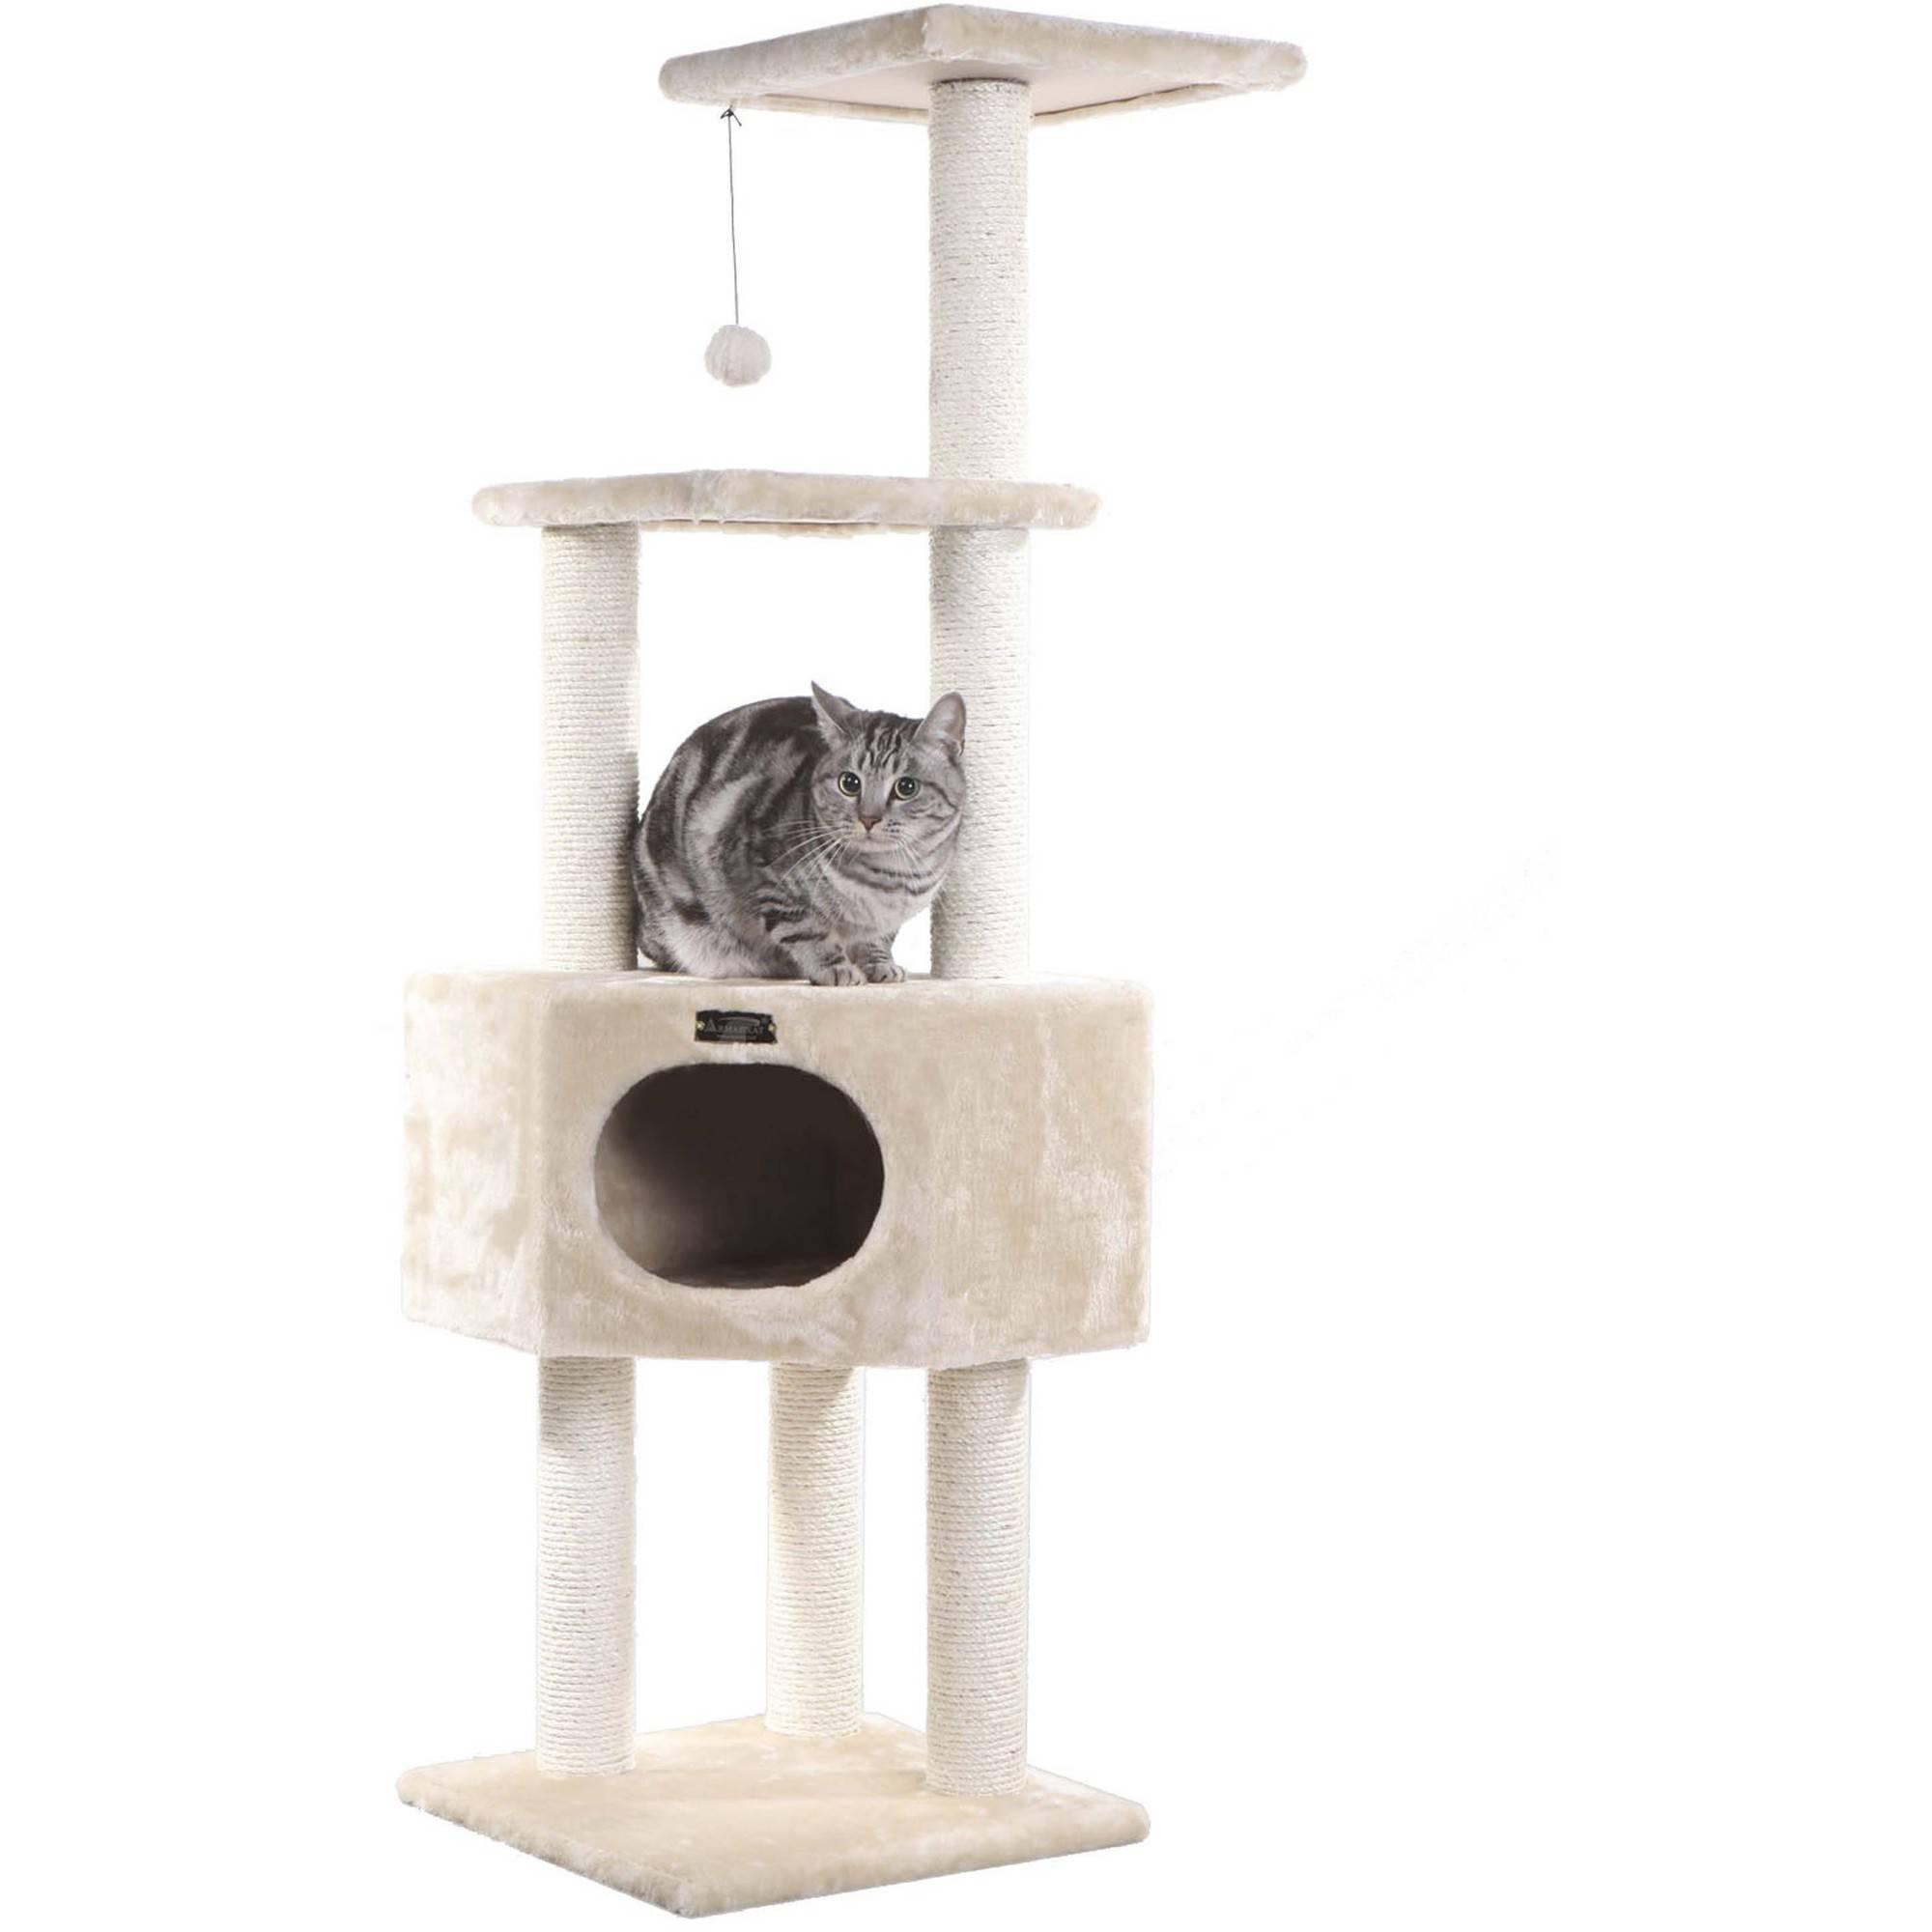 Armarkat Classic Cat Tree Model A6501, 65 inch Beige